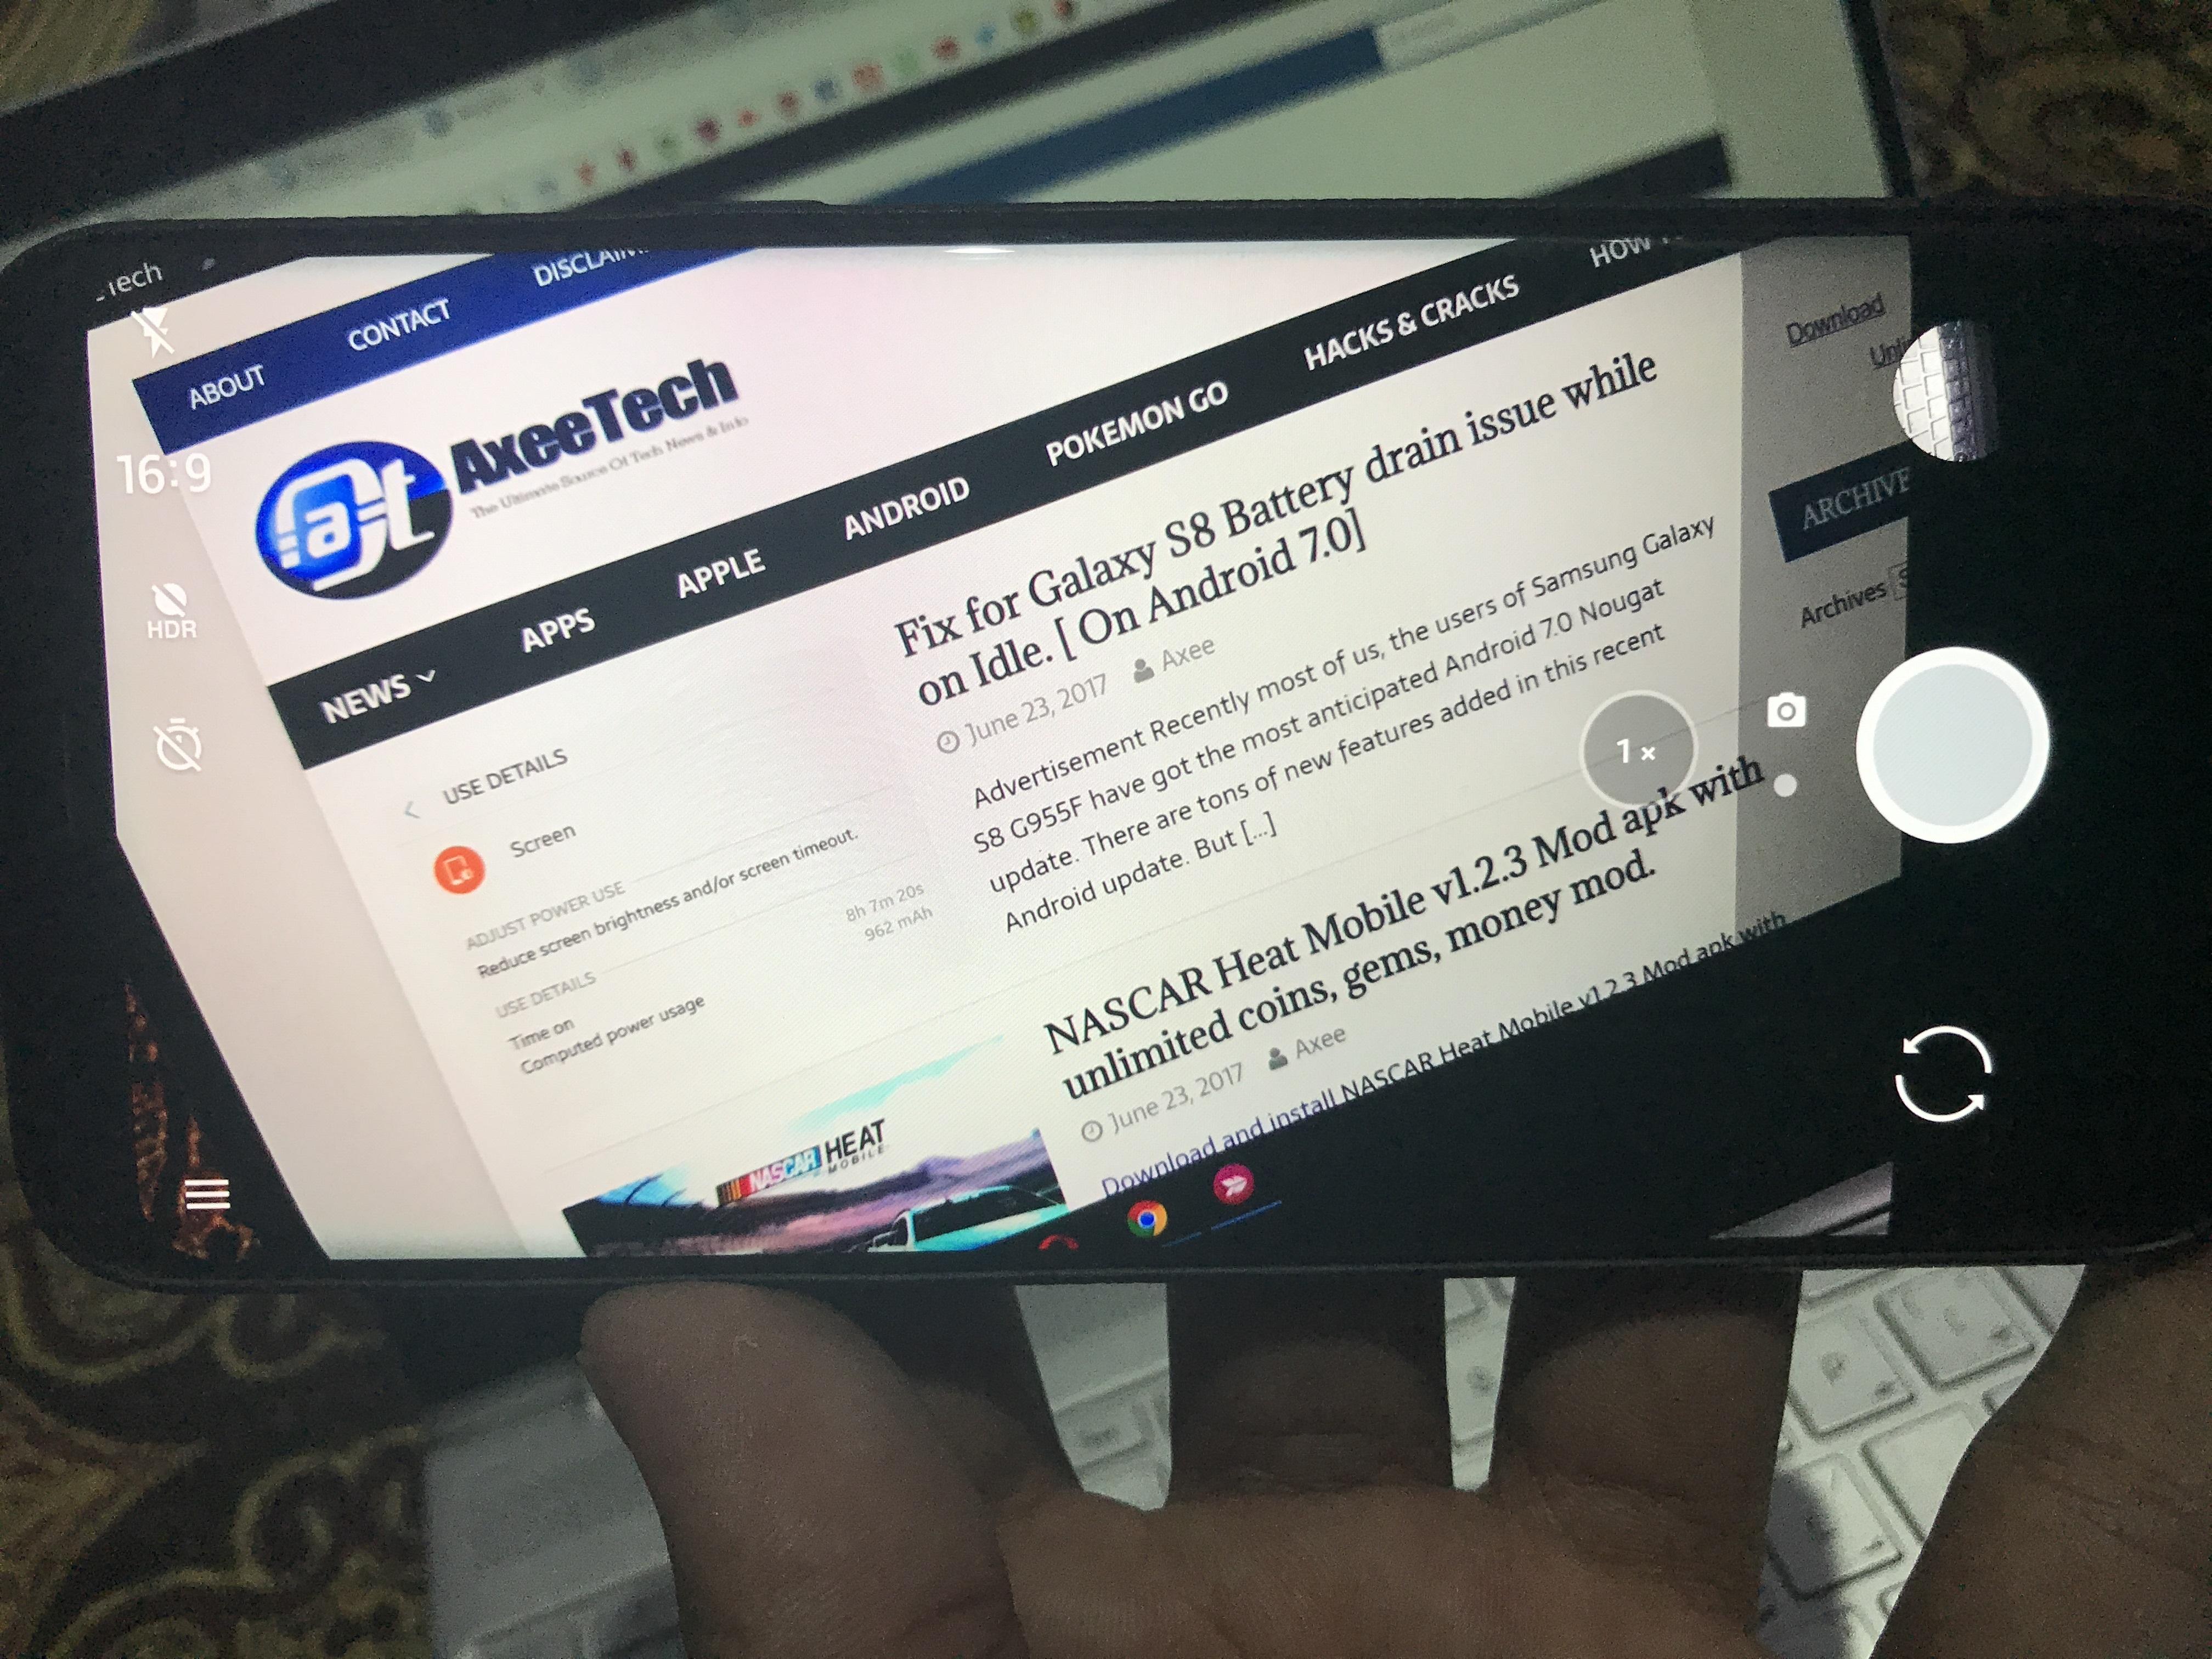 OnePlus_5_Camera_Apk_2.0.0 (2)